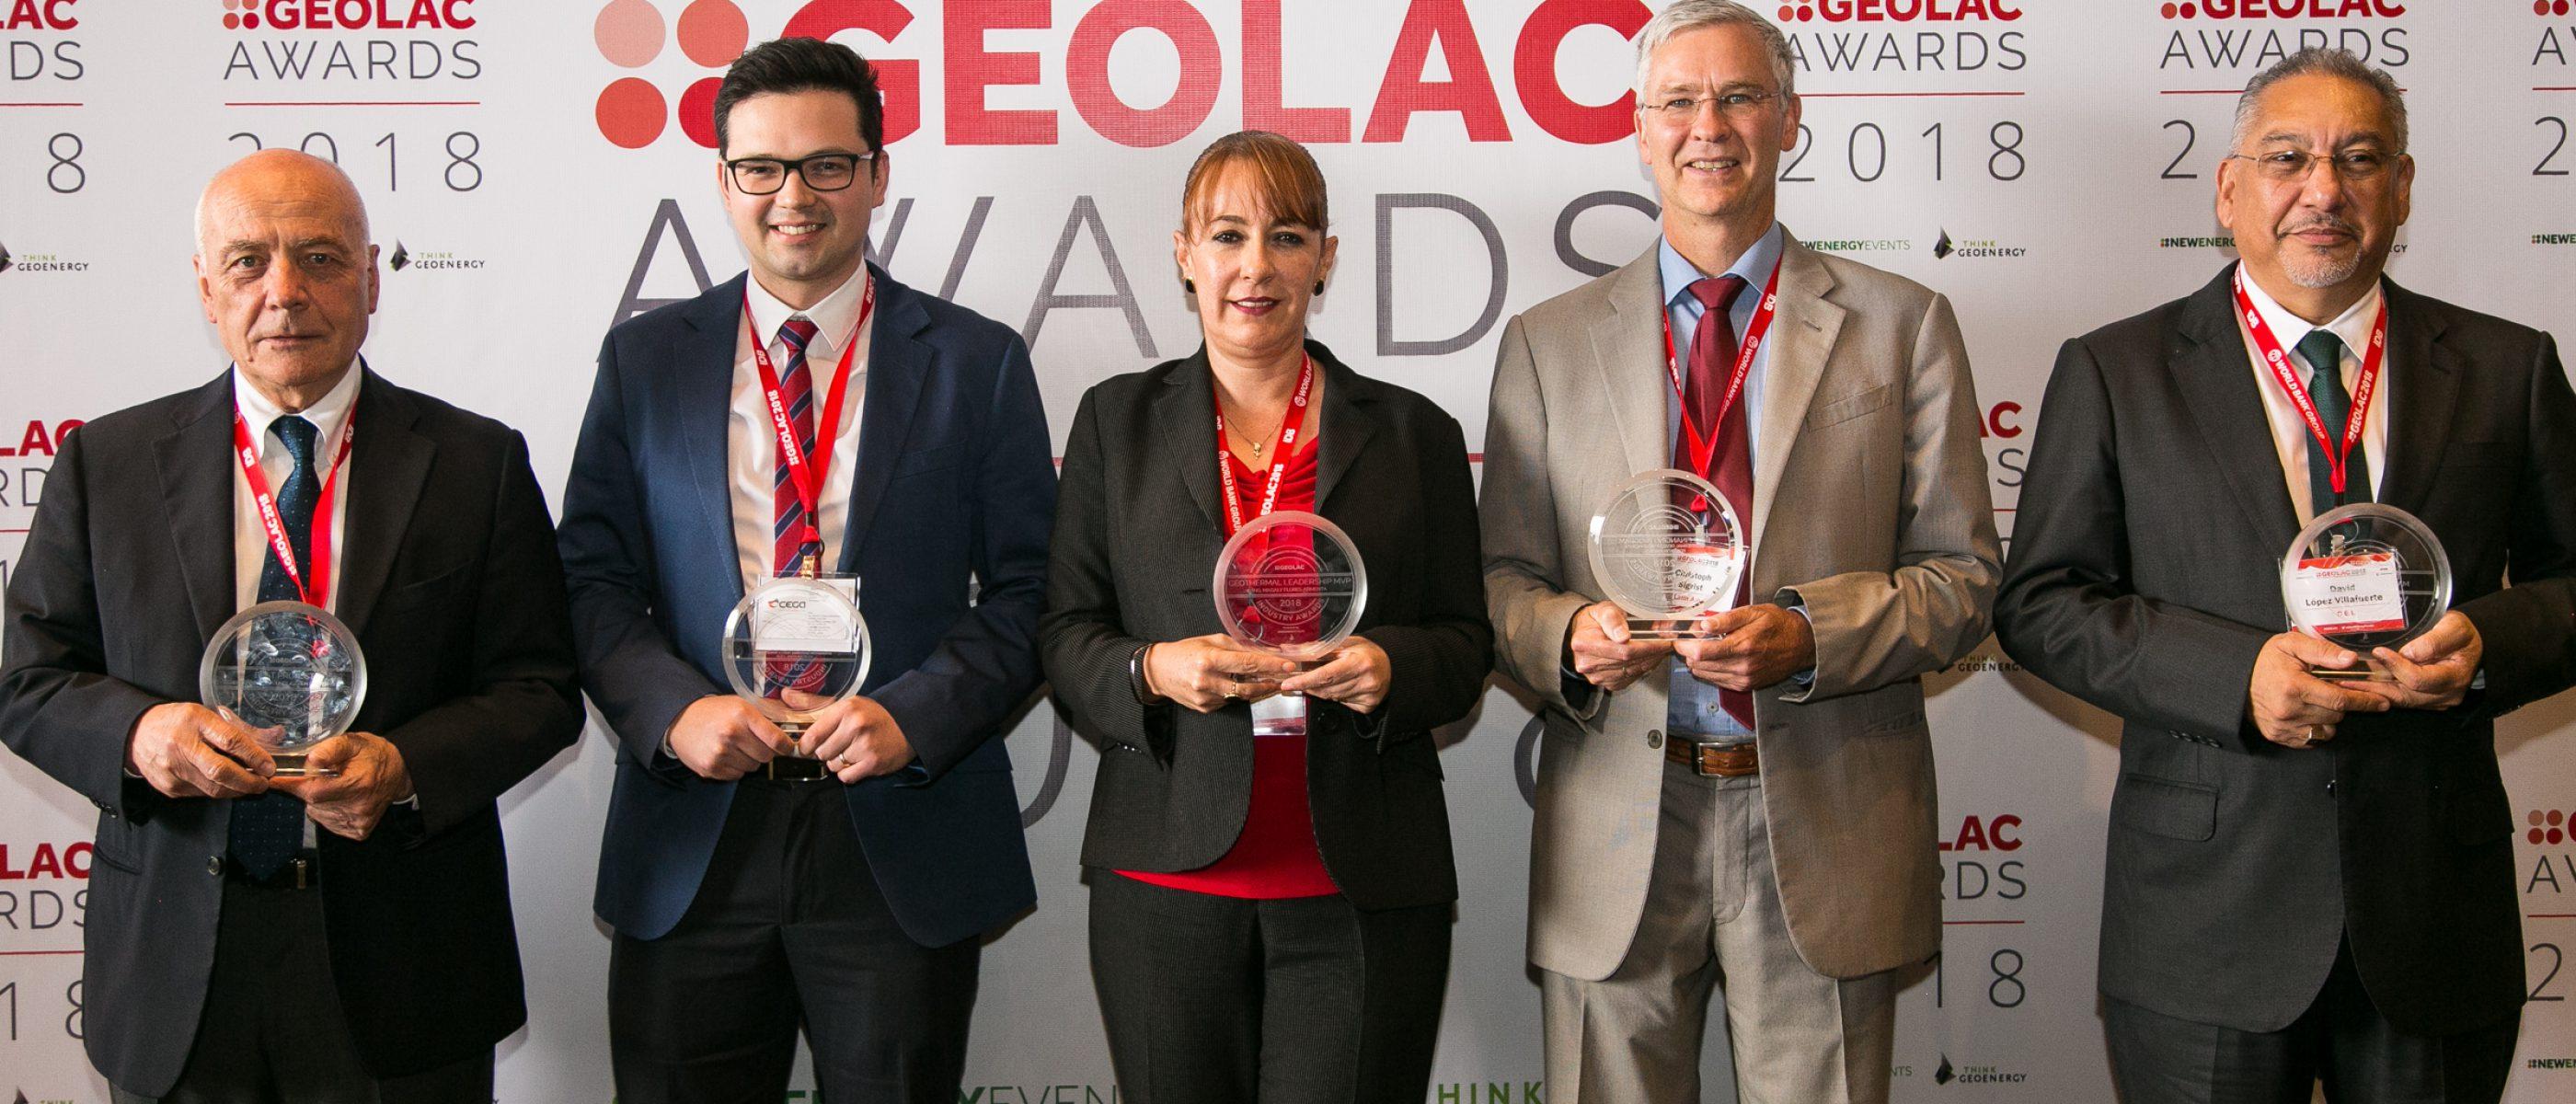 GEOLAC 2019 award winners